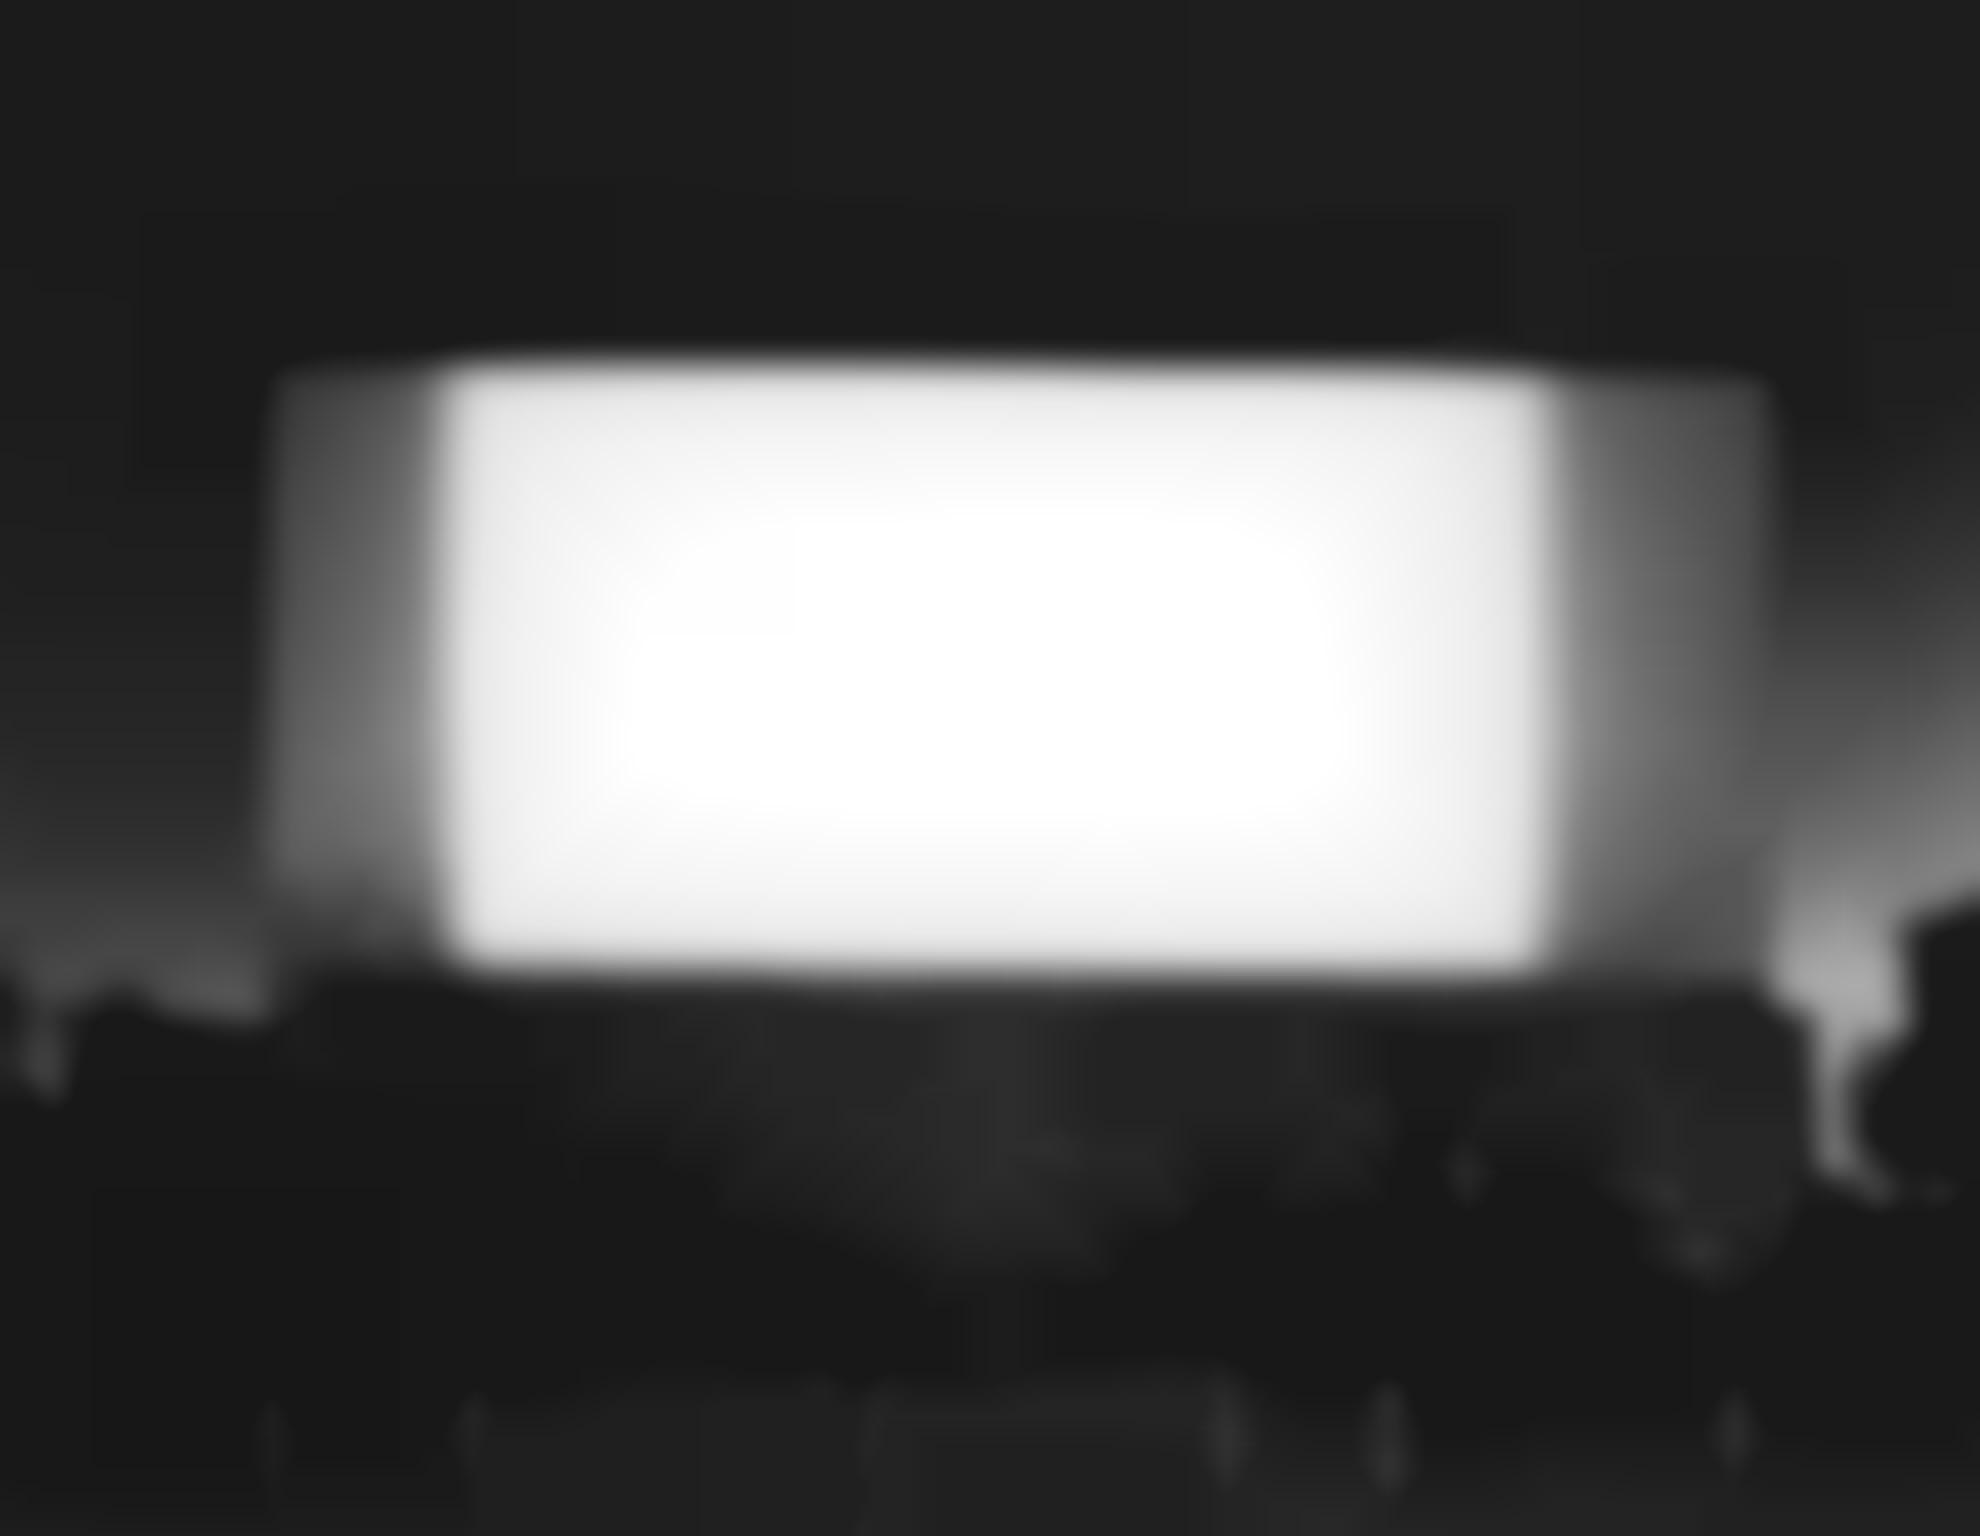 Hiroshi Sugimoto-Centinela Drive-In (Los Angeles)-1993